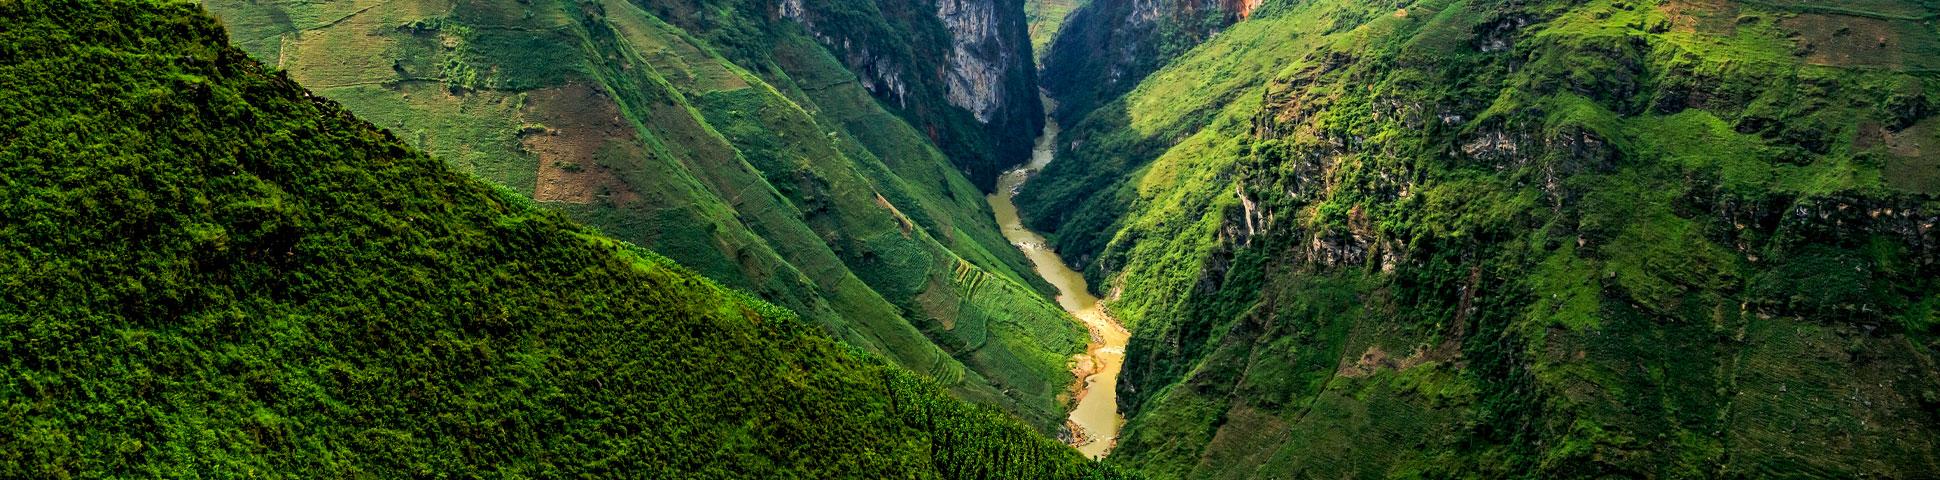 Vietnam Mountain Biking Tour